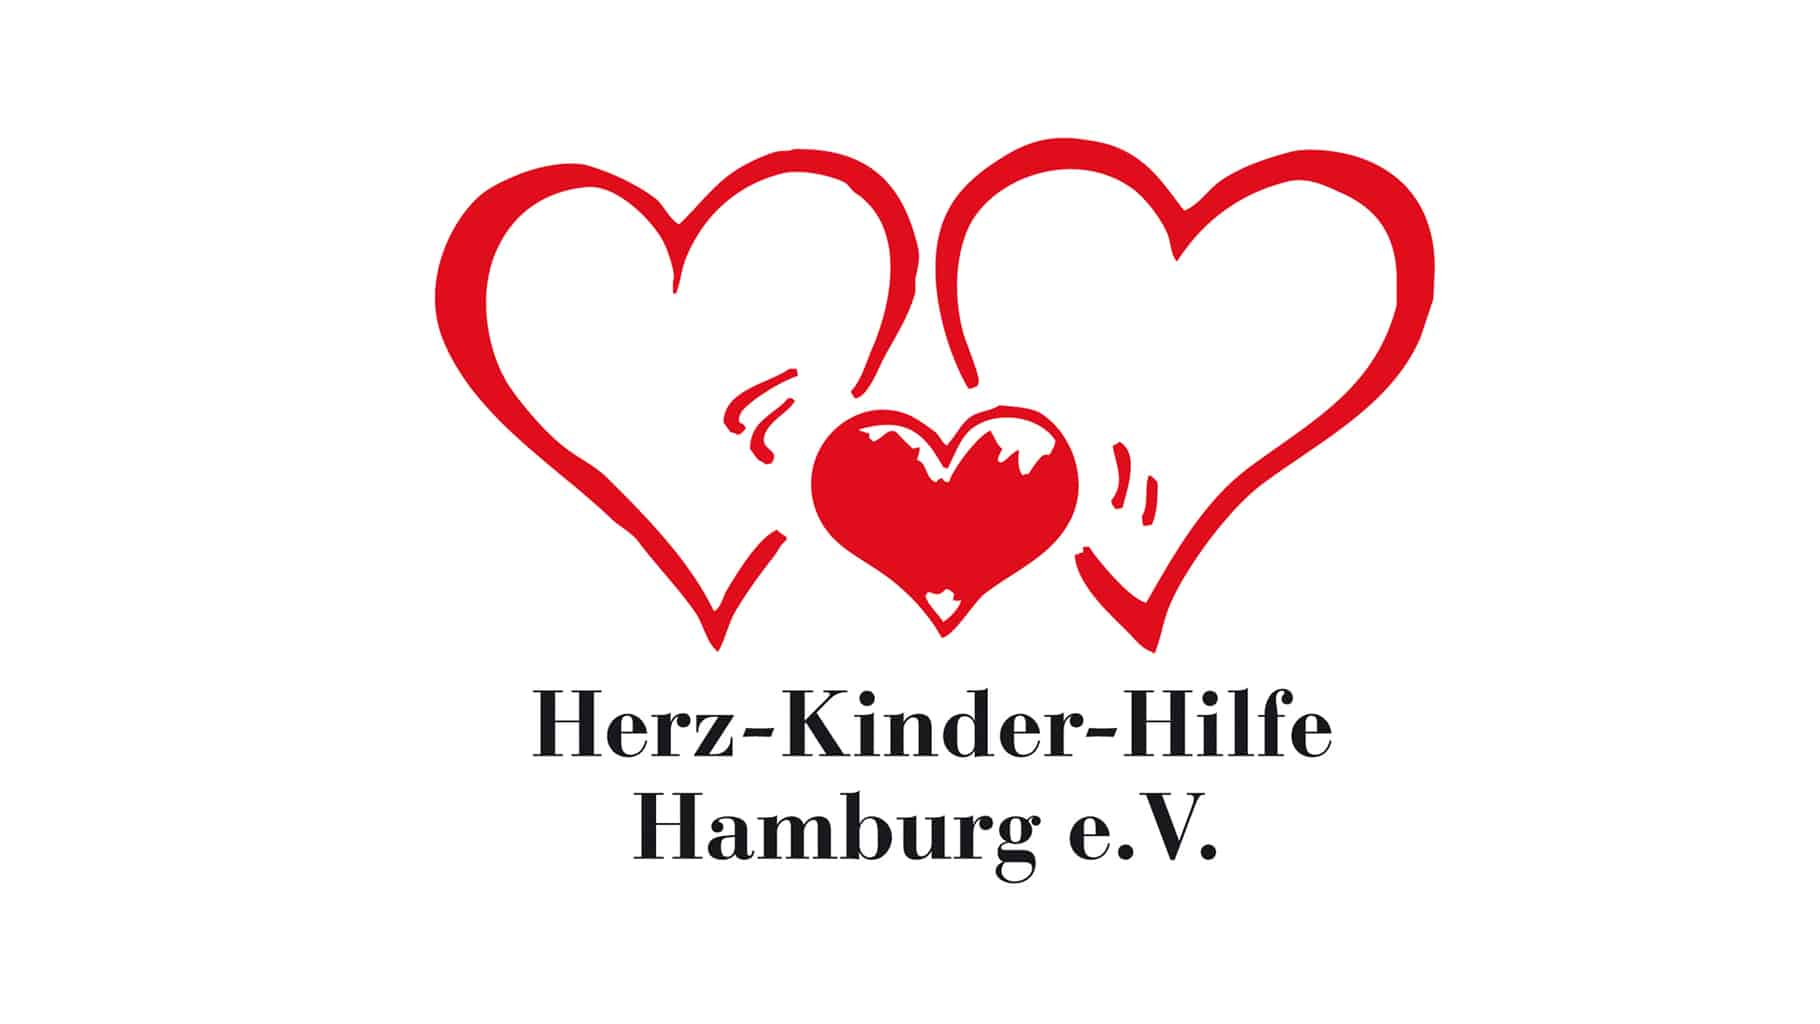 Herz-Kinder-Hilfe Hamburg Logo- News